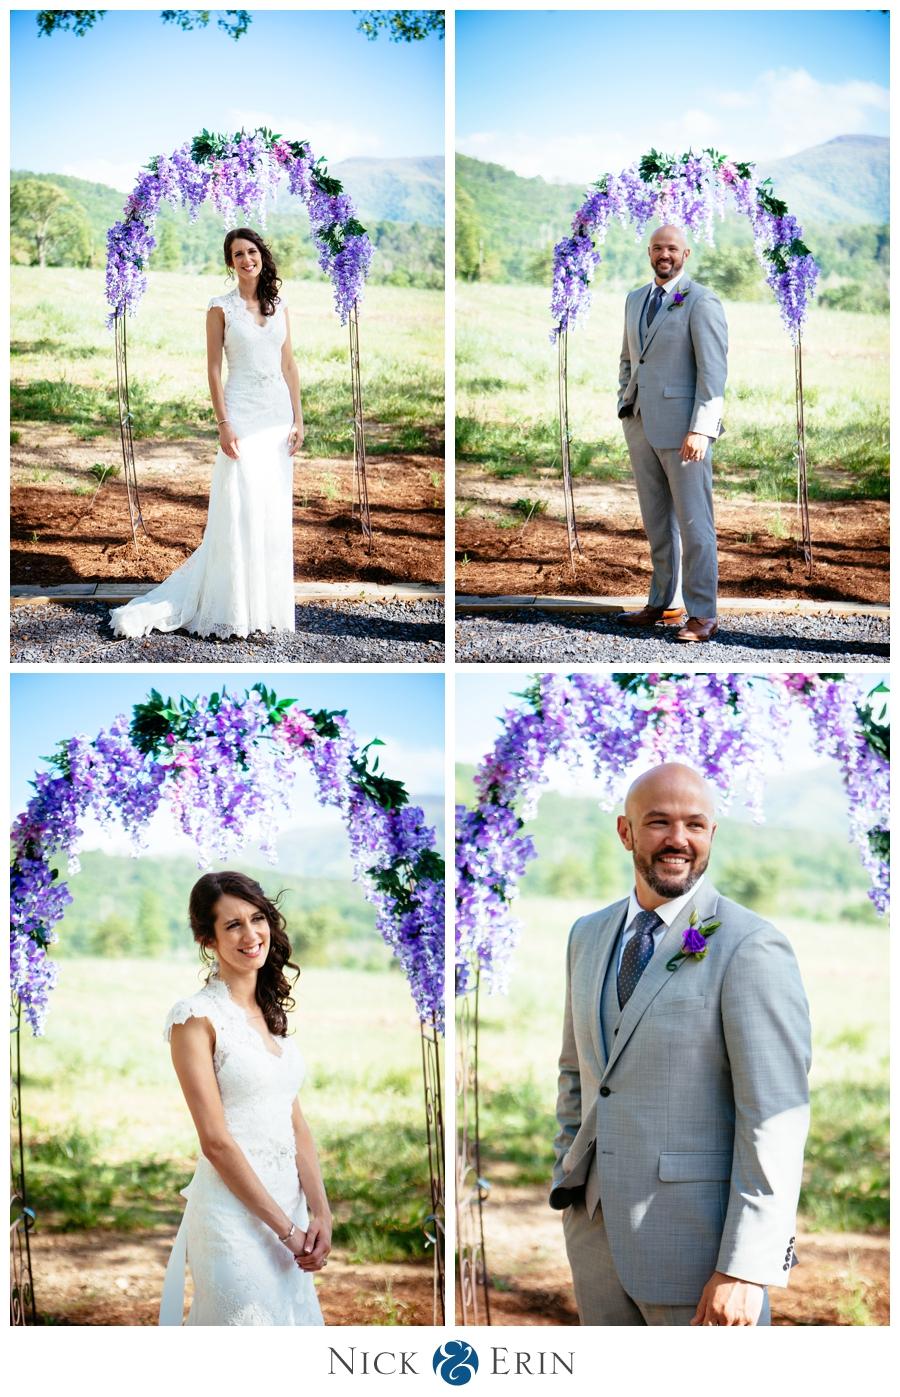 Donner_Photography_Shenandoah Woods_Wedding_Nick_and_Elizabeth_0039